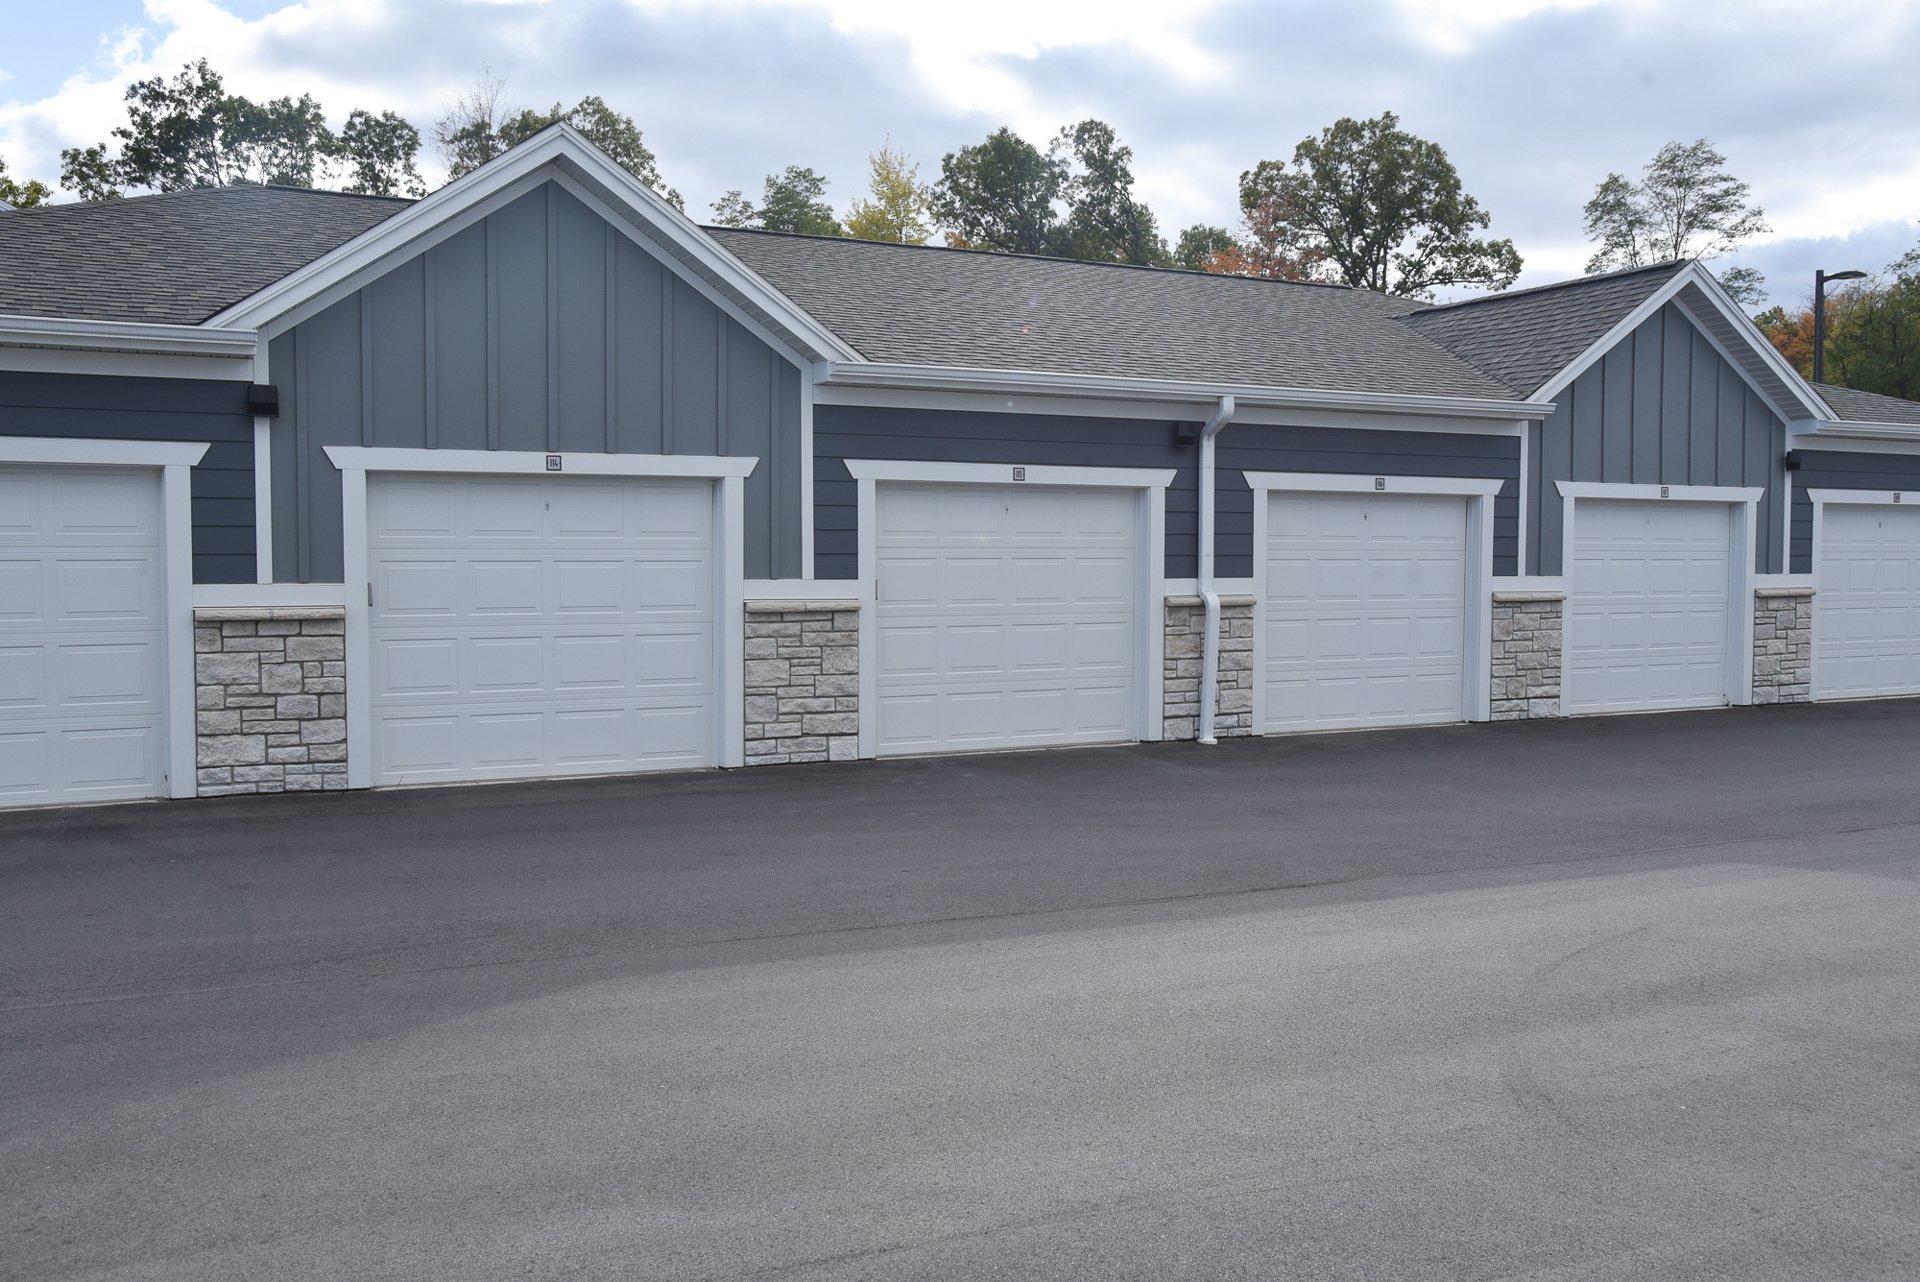 Springs at Knapp's Crossing detached garages